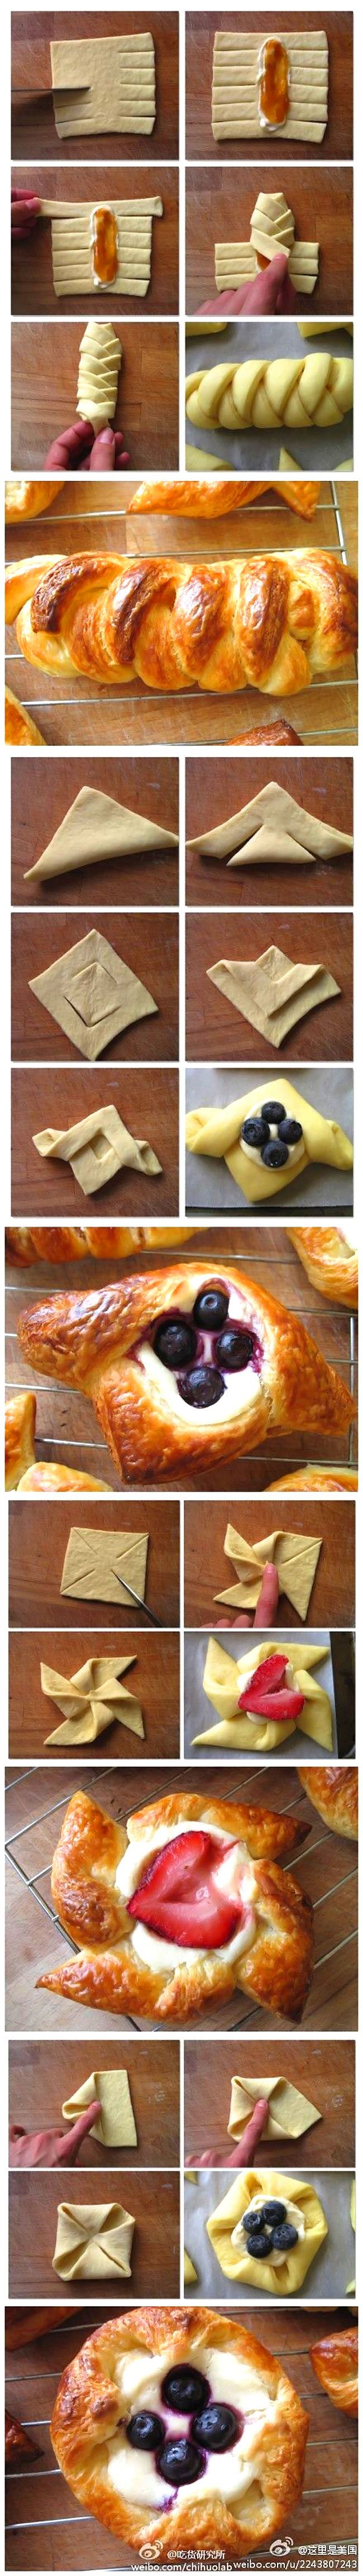 cool-pastry-folding-ideas-recipe